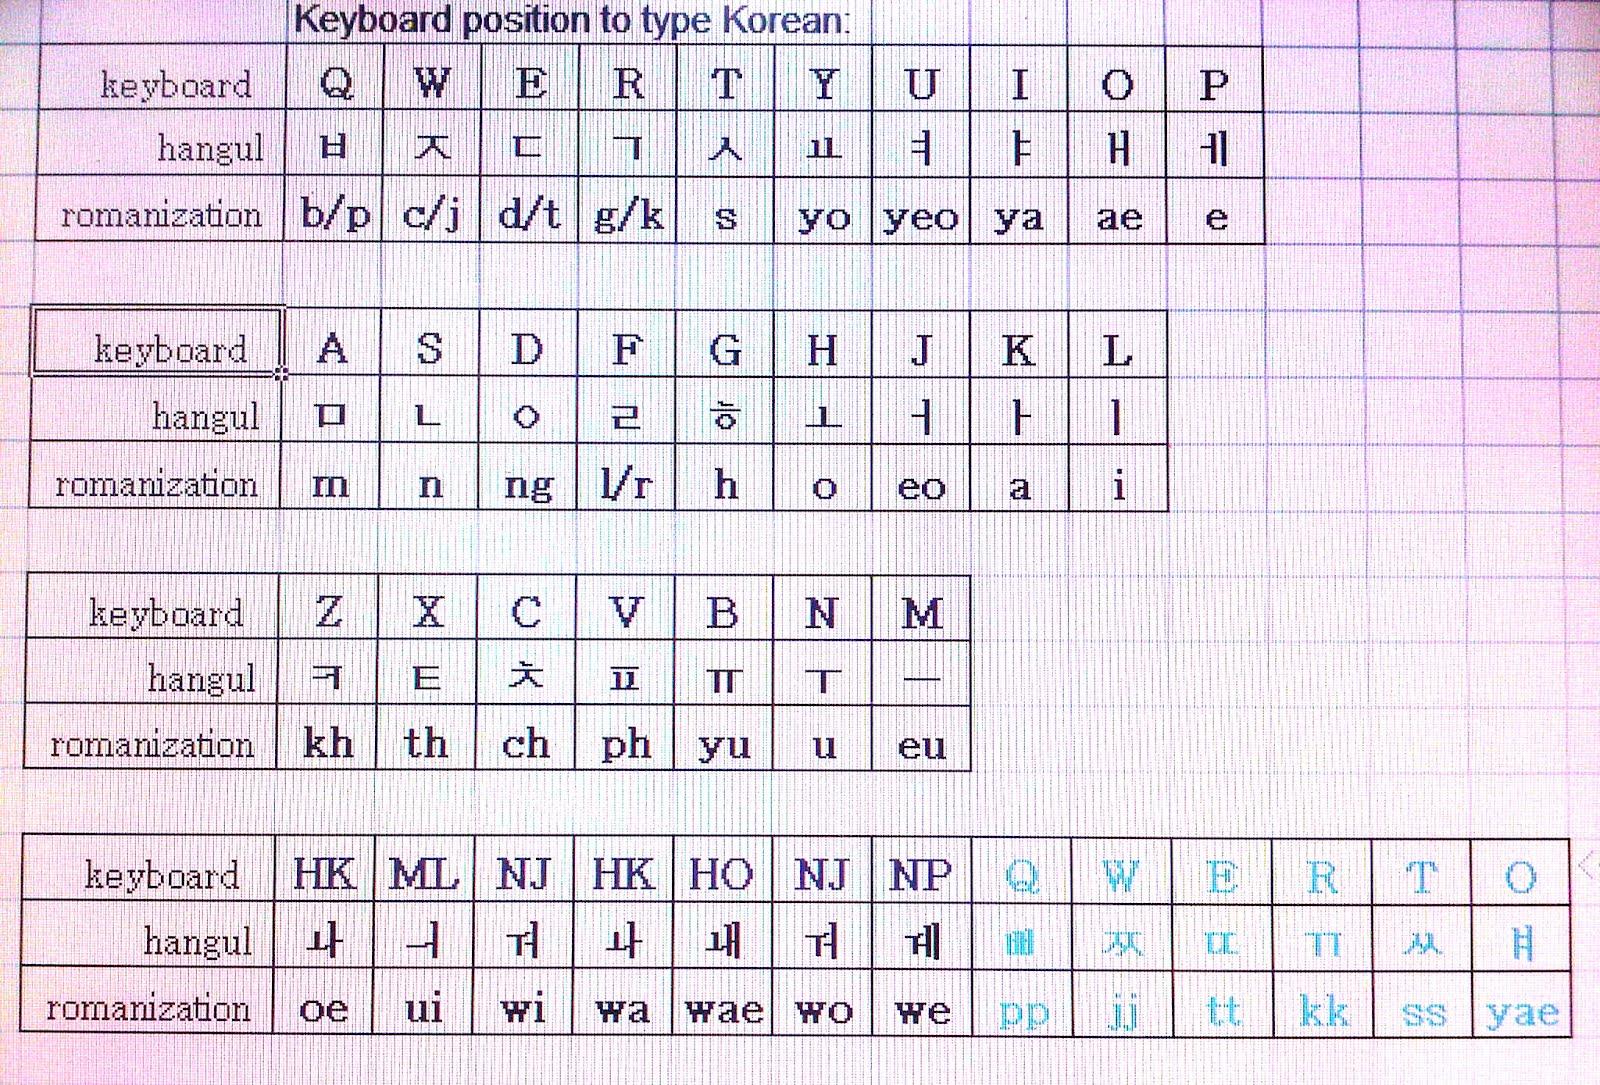 Contoh lengkap koleksi huruf korea dalam fitur abjad yang